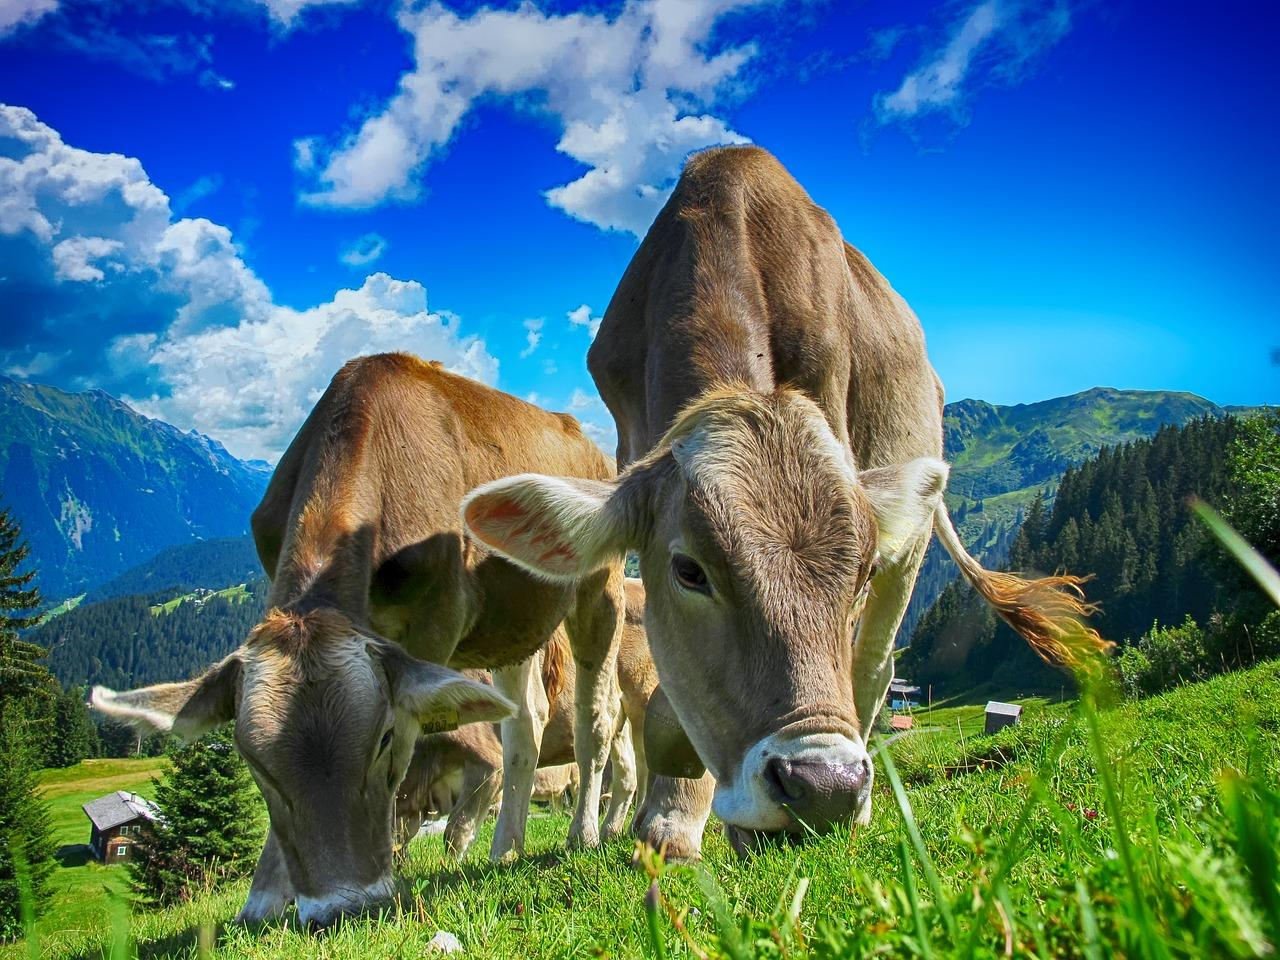 cows-2641195_1280-1513364787124.jpg